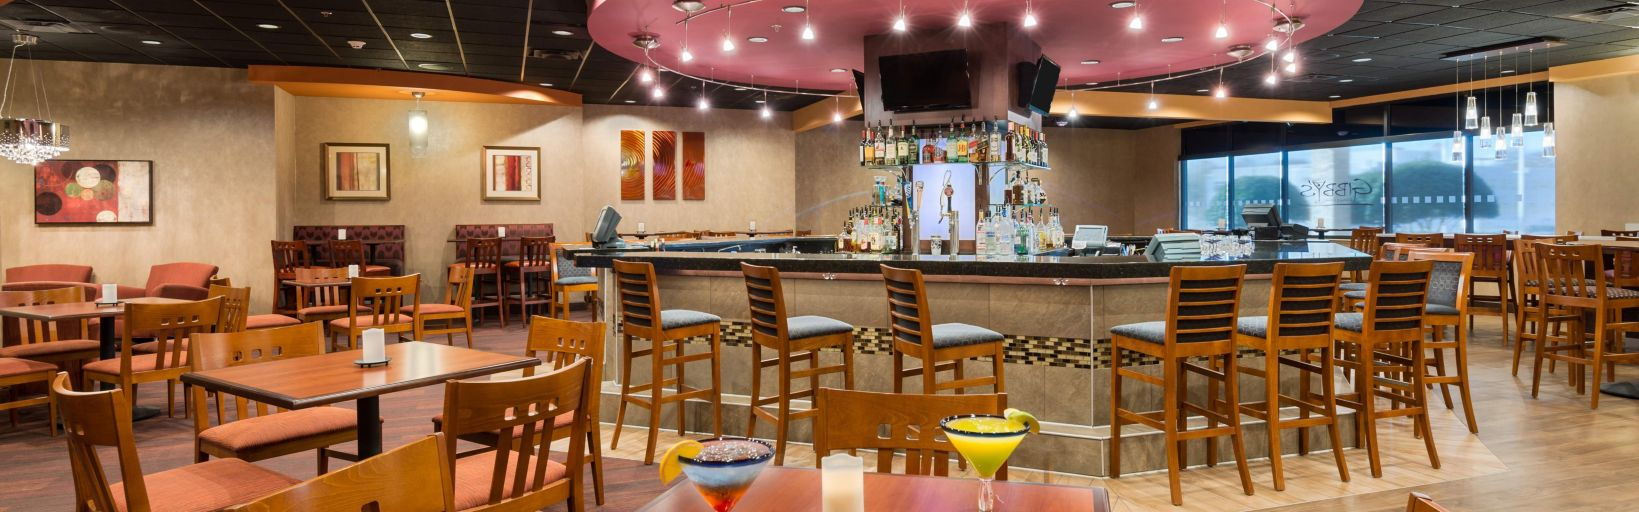 Bar And Lounge Gibby 39 S Dining Drinks Dinner Entertainment Restaurant